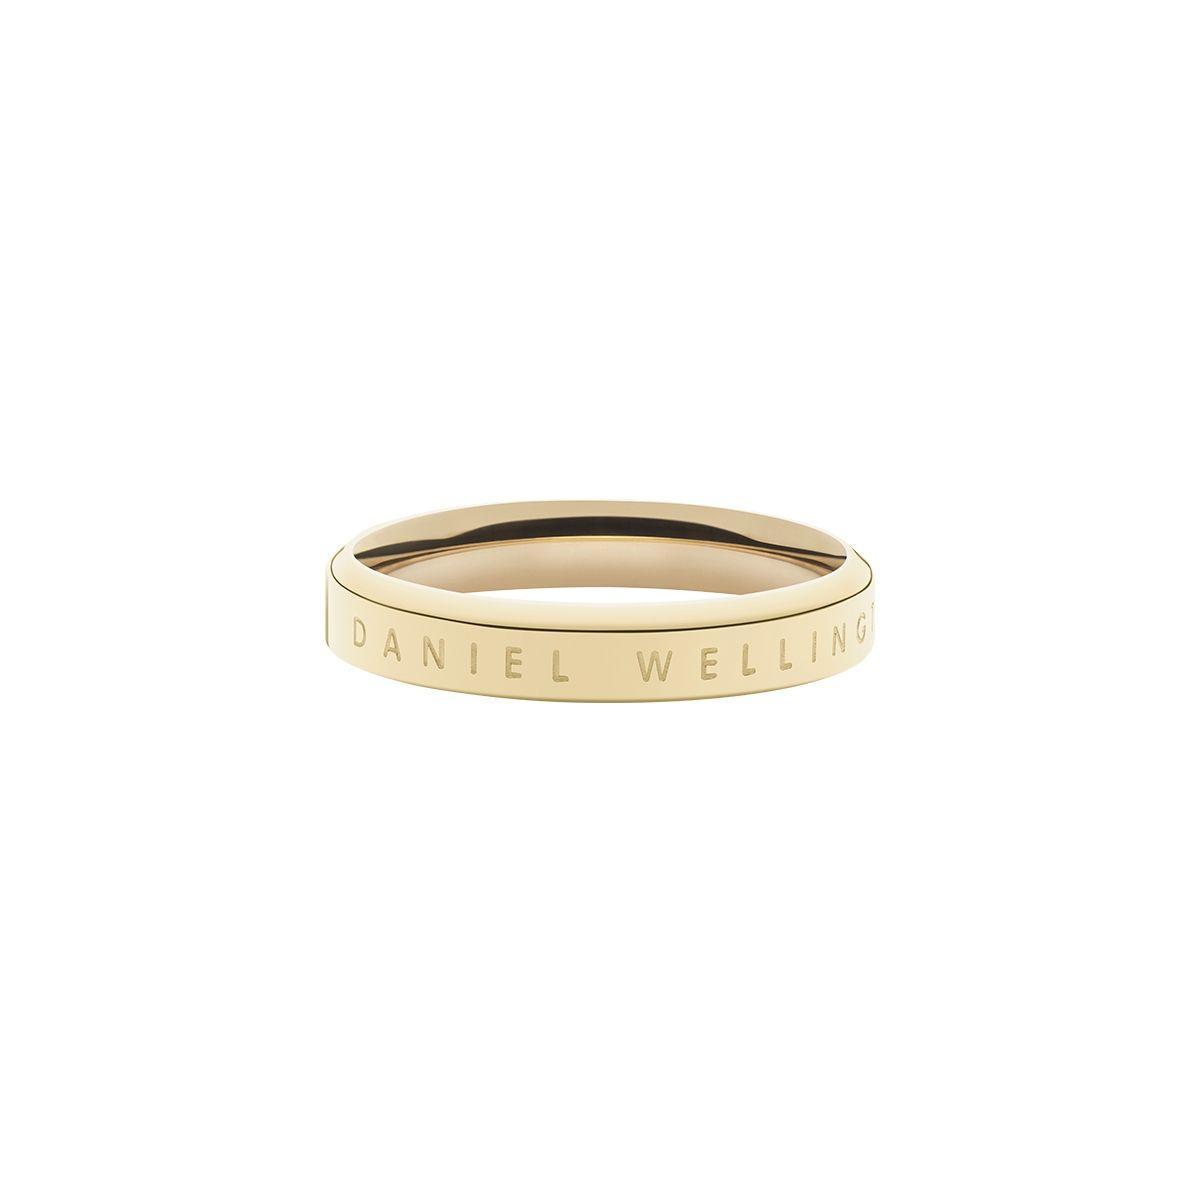 dw官网 dw手表官网 dw中国官网 dw官方旗舰店 DW DW官网  Classic Ring Gold 48mm